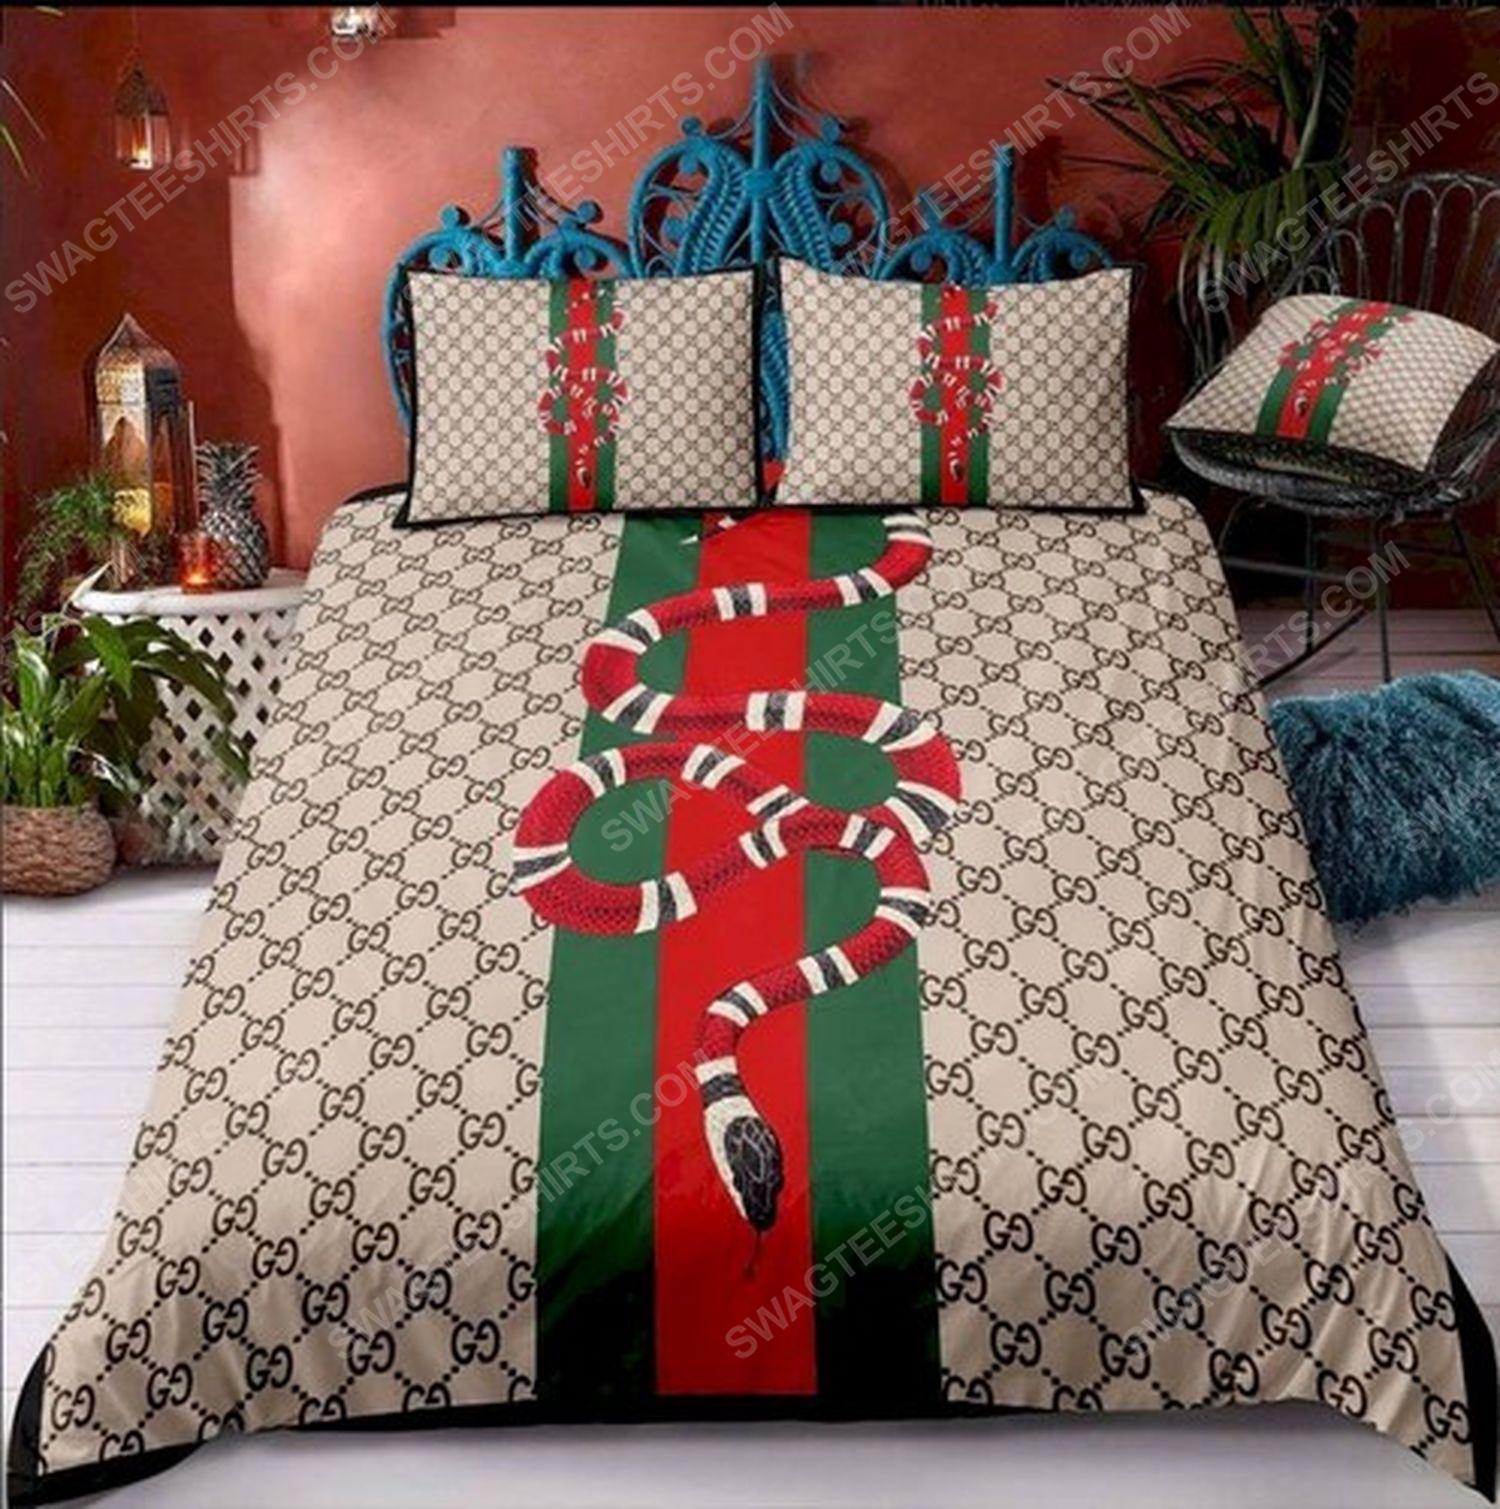 Gucci and snack symbols full print duvet cover bedding set 1